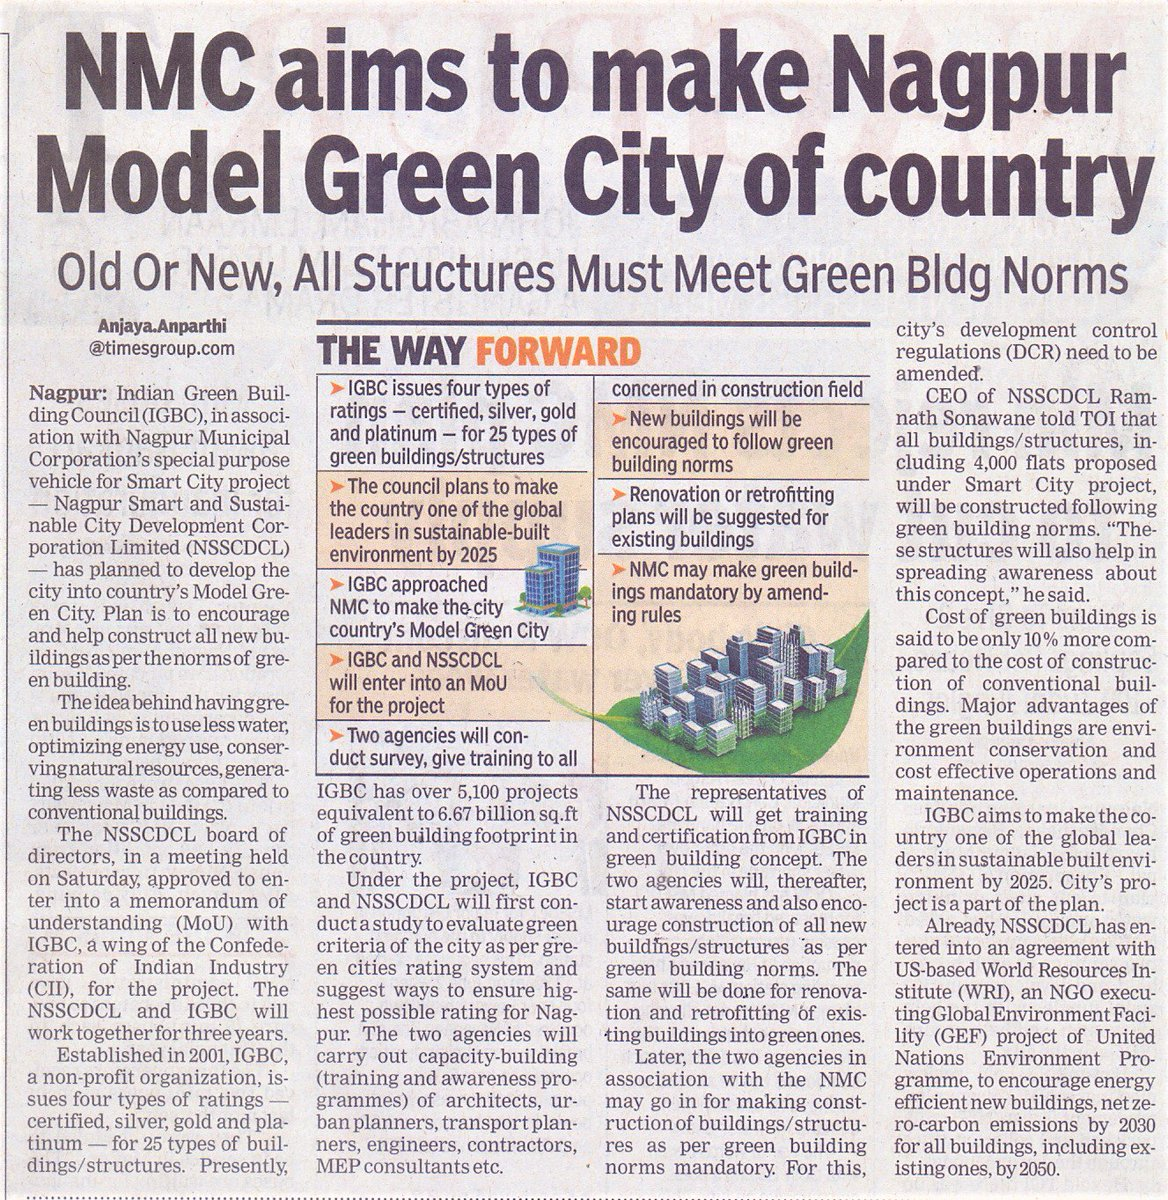 Nagpur Municipal Corporation aims to make Nagpur Model Green City of country